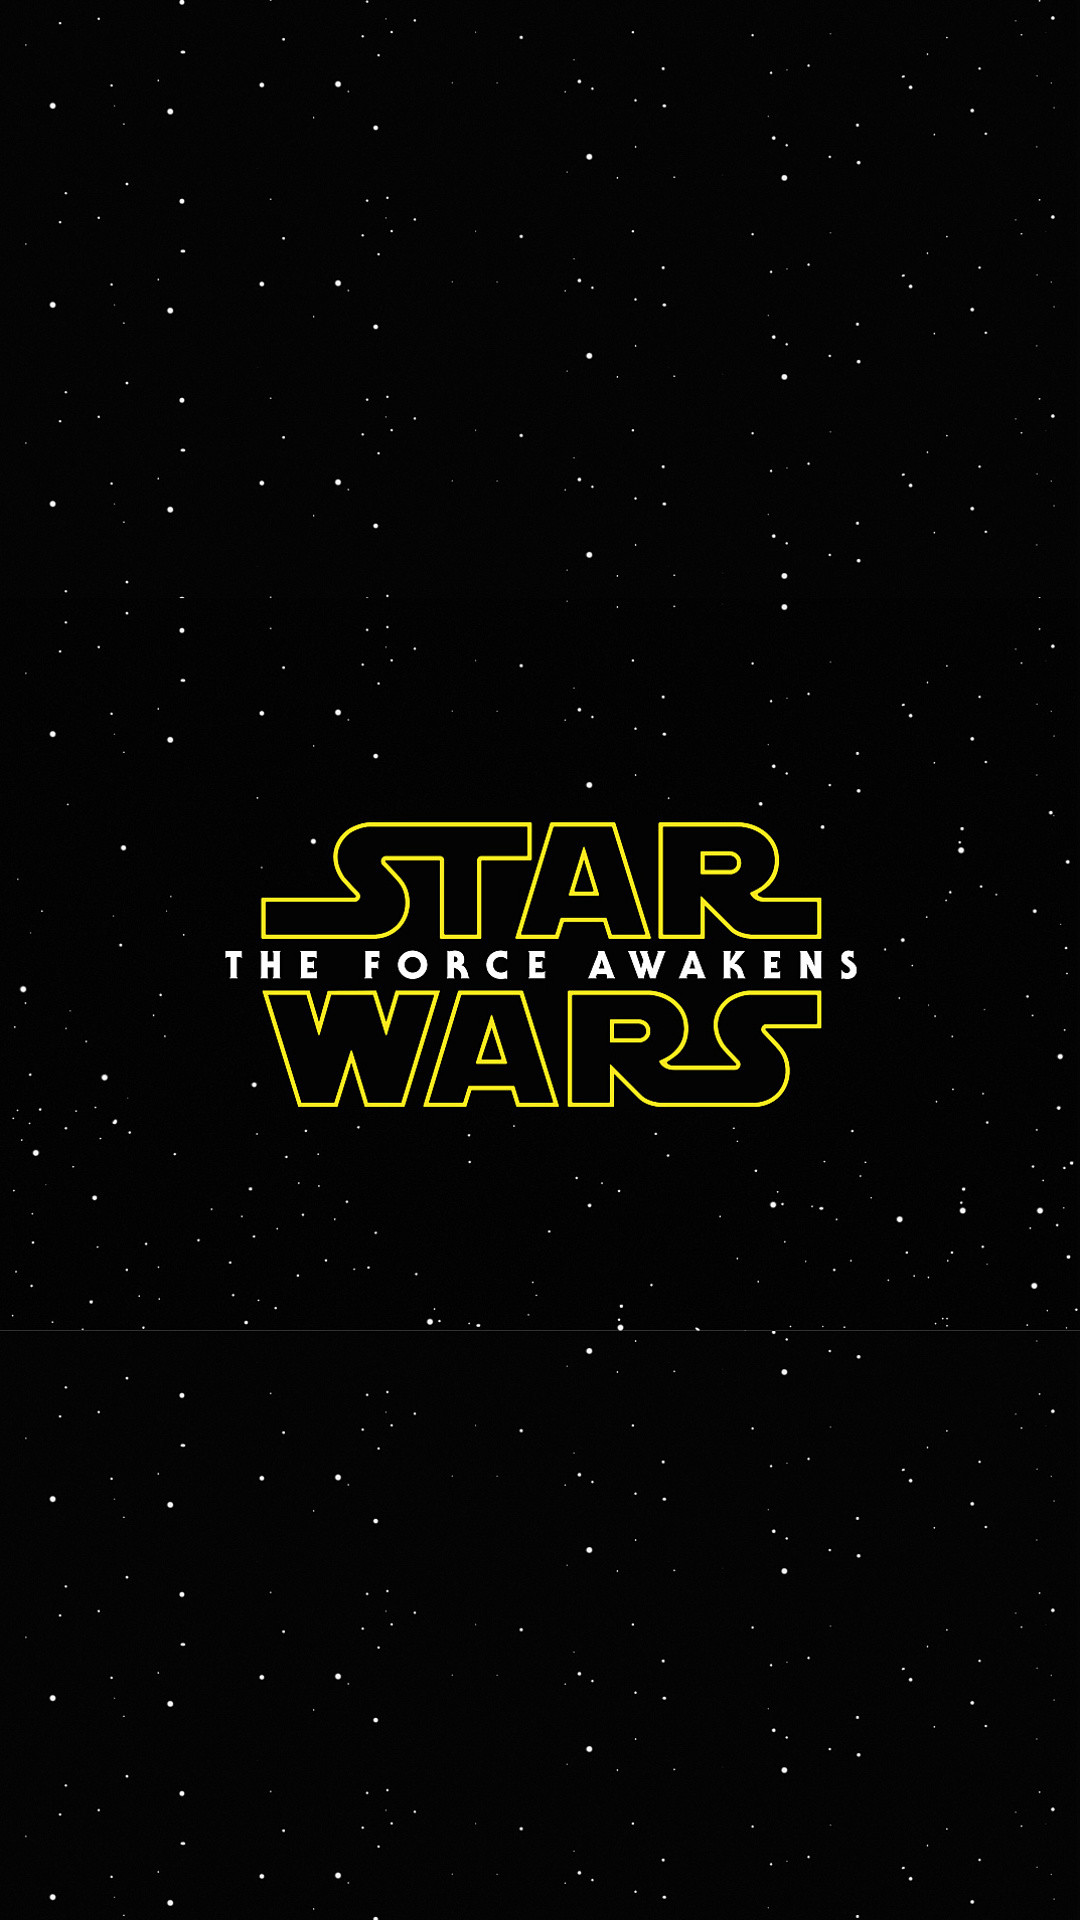 Explore Star Wars Logos, Star Wars Vii, and more!